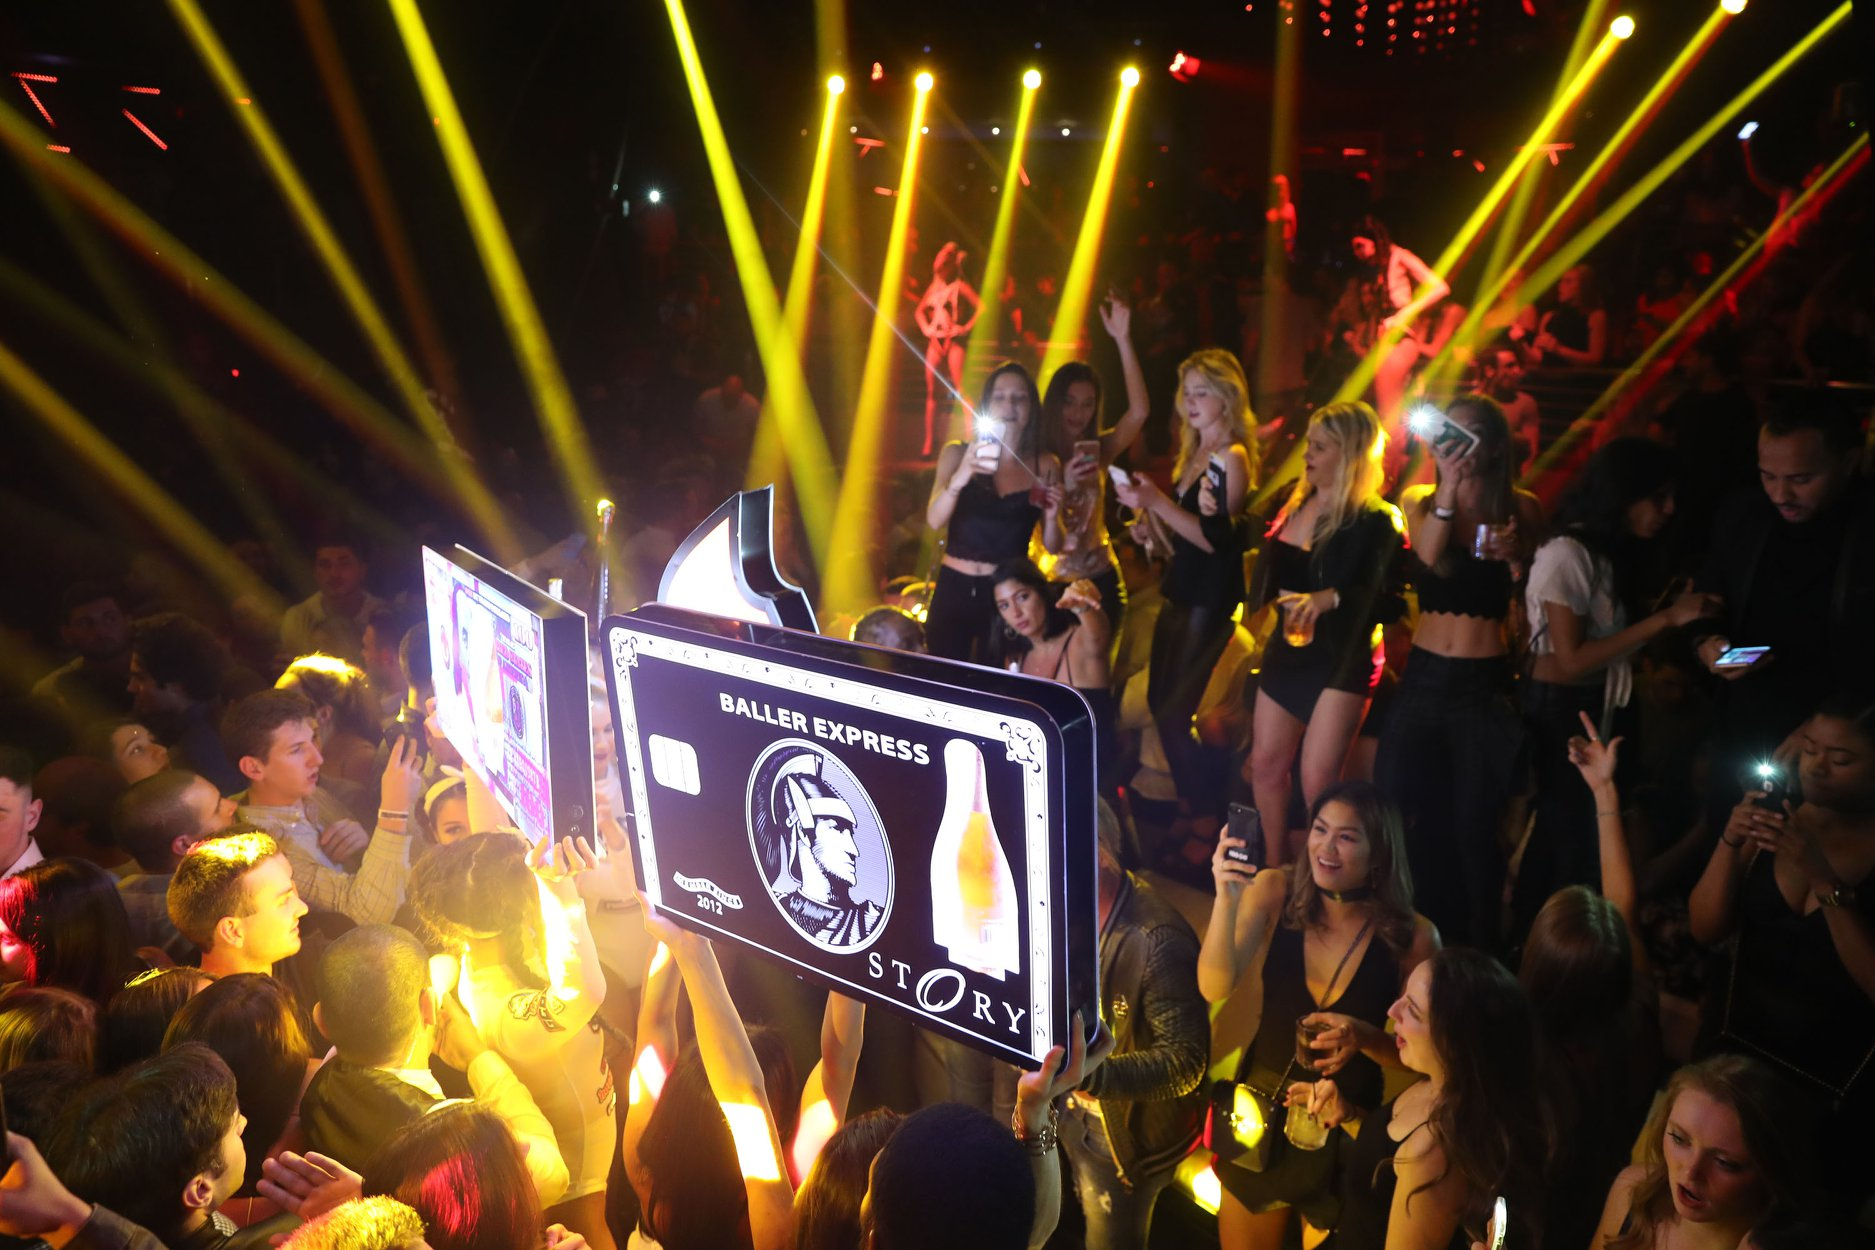 Club Story Miami Beach, FL